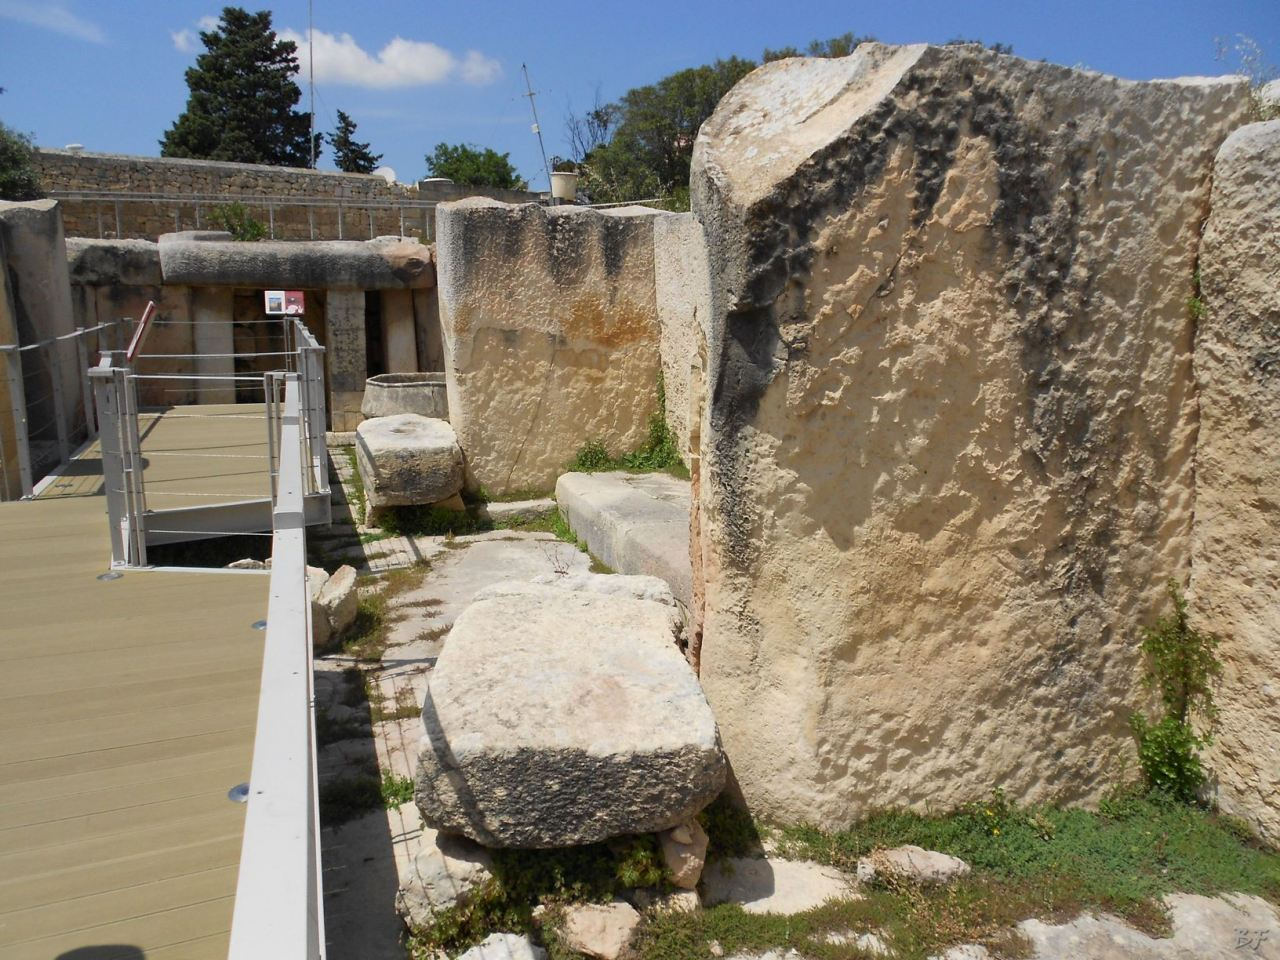 Tarxien-Tempio-Megalitico-Malta-30